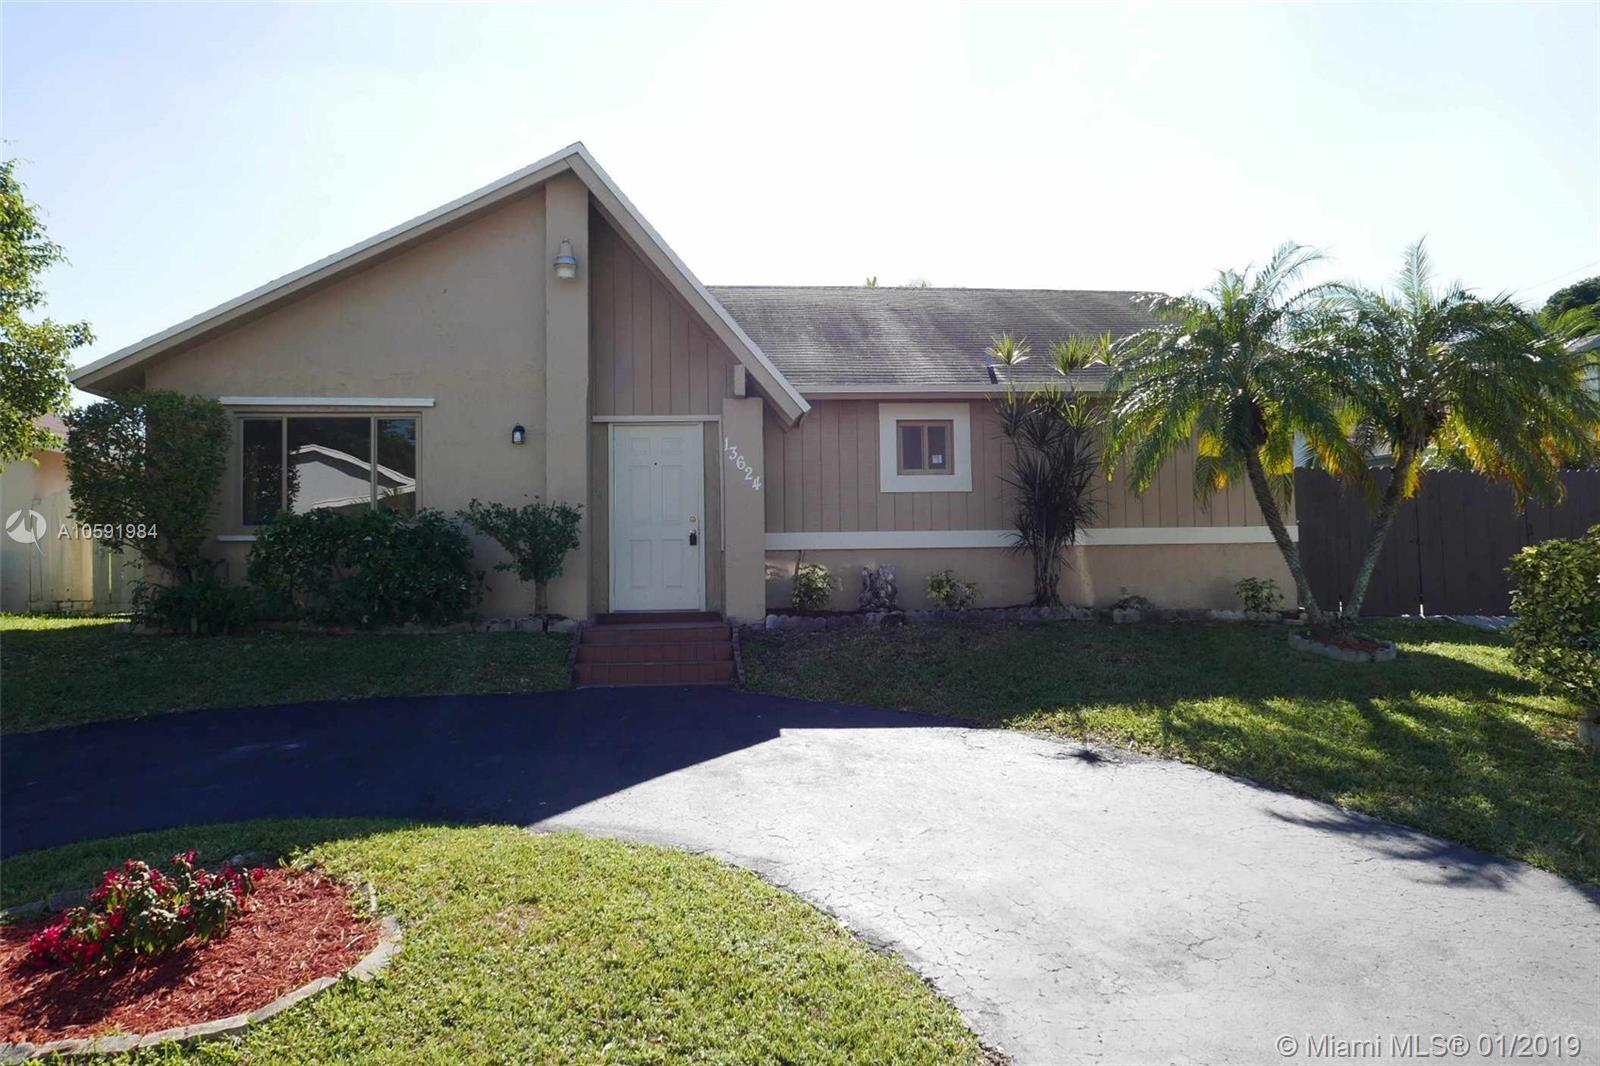 13624 287th Ln, Homestead, FL 33033 - Homestead, FL real estate listing